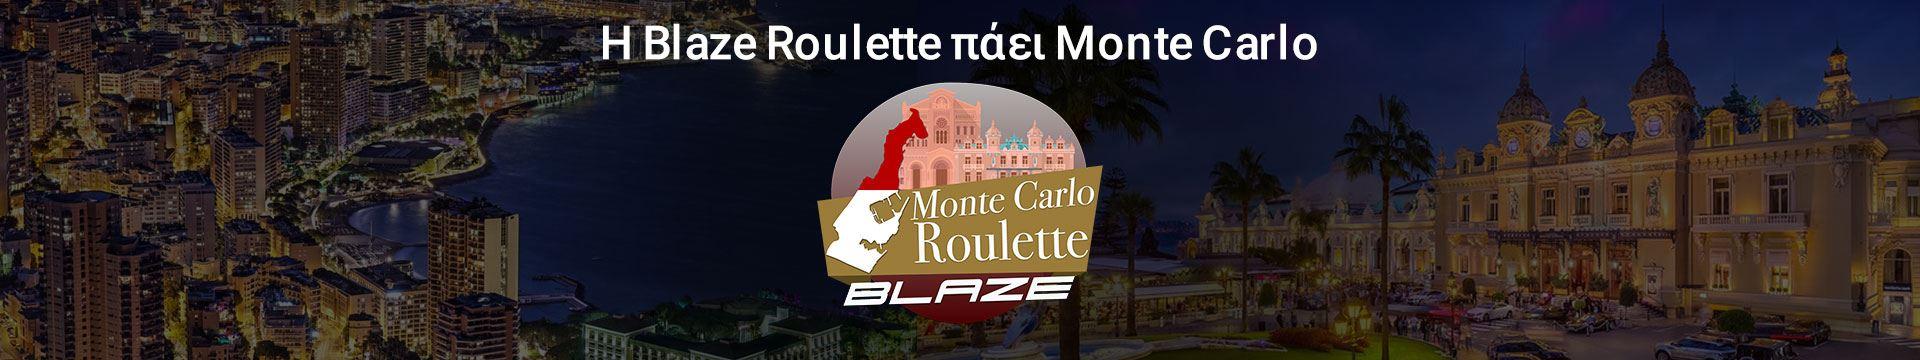 Blaze_Monte_Carlo